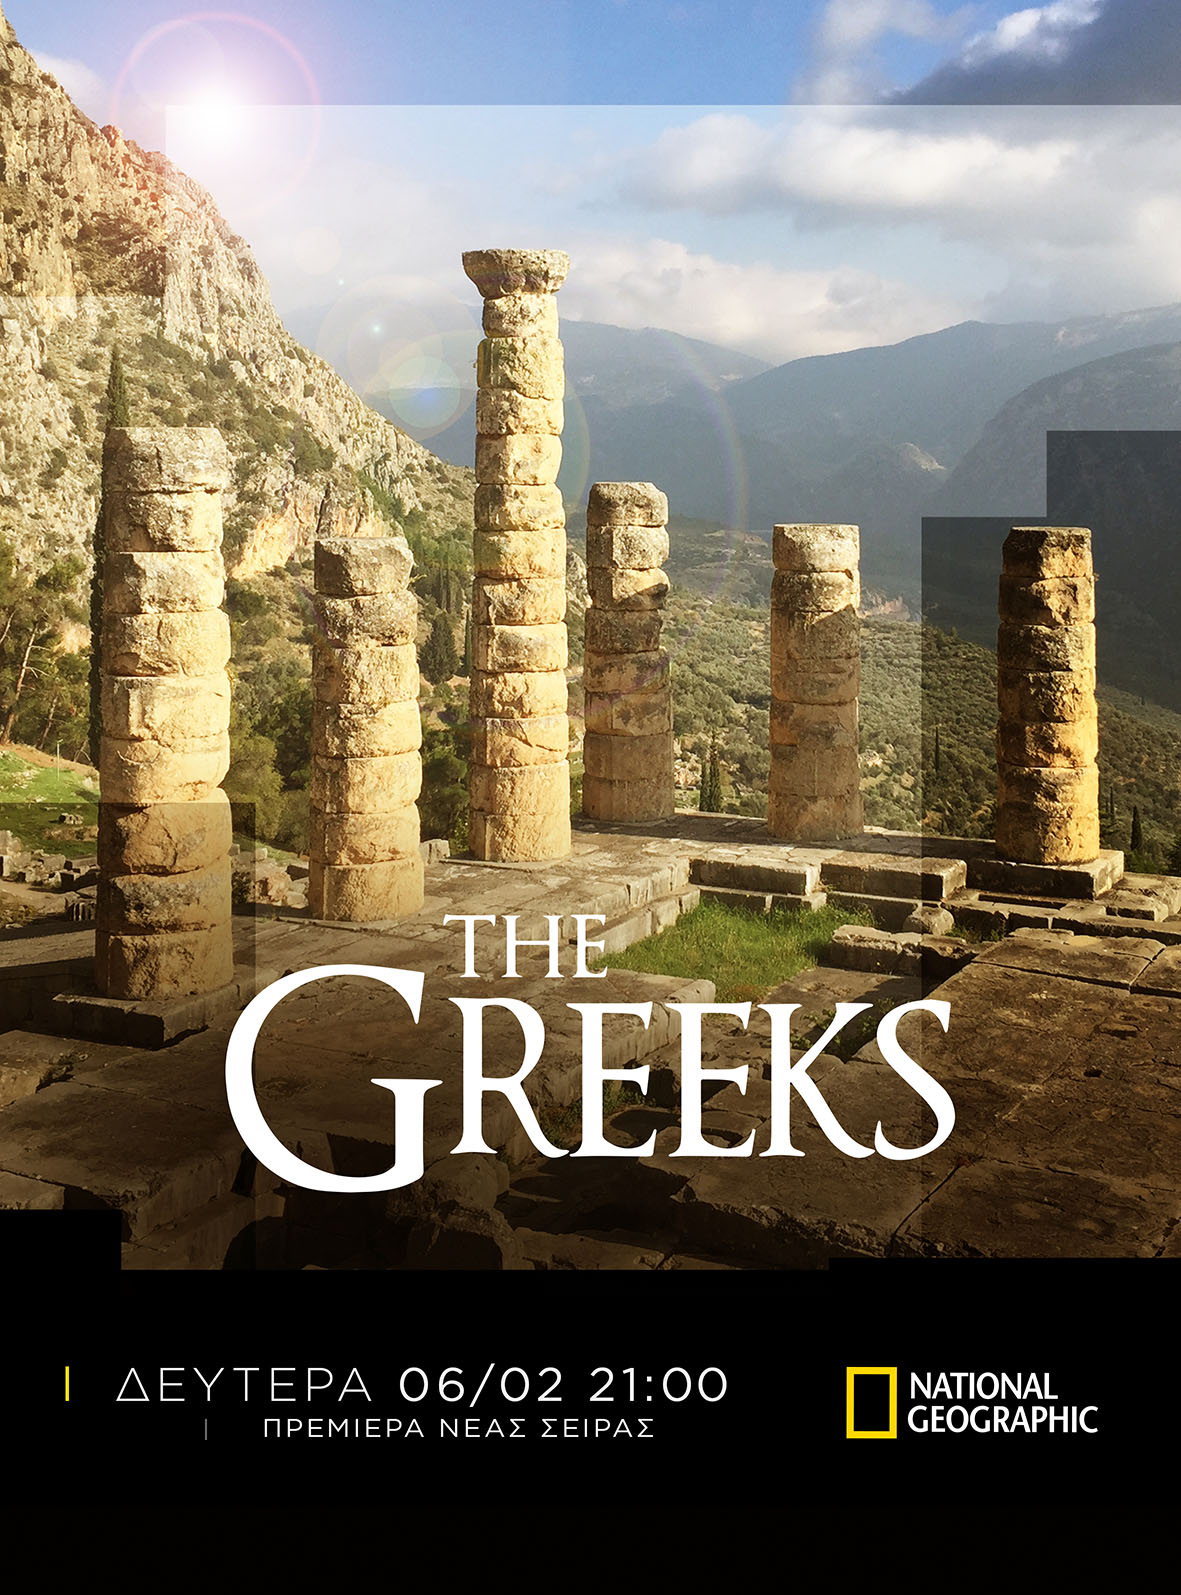 NG_THE GREEKS (Poster)